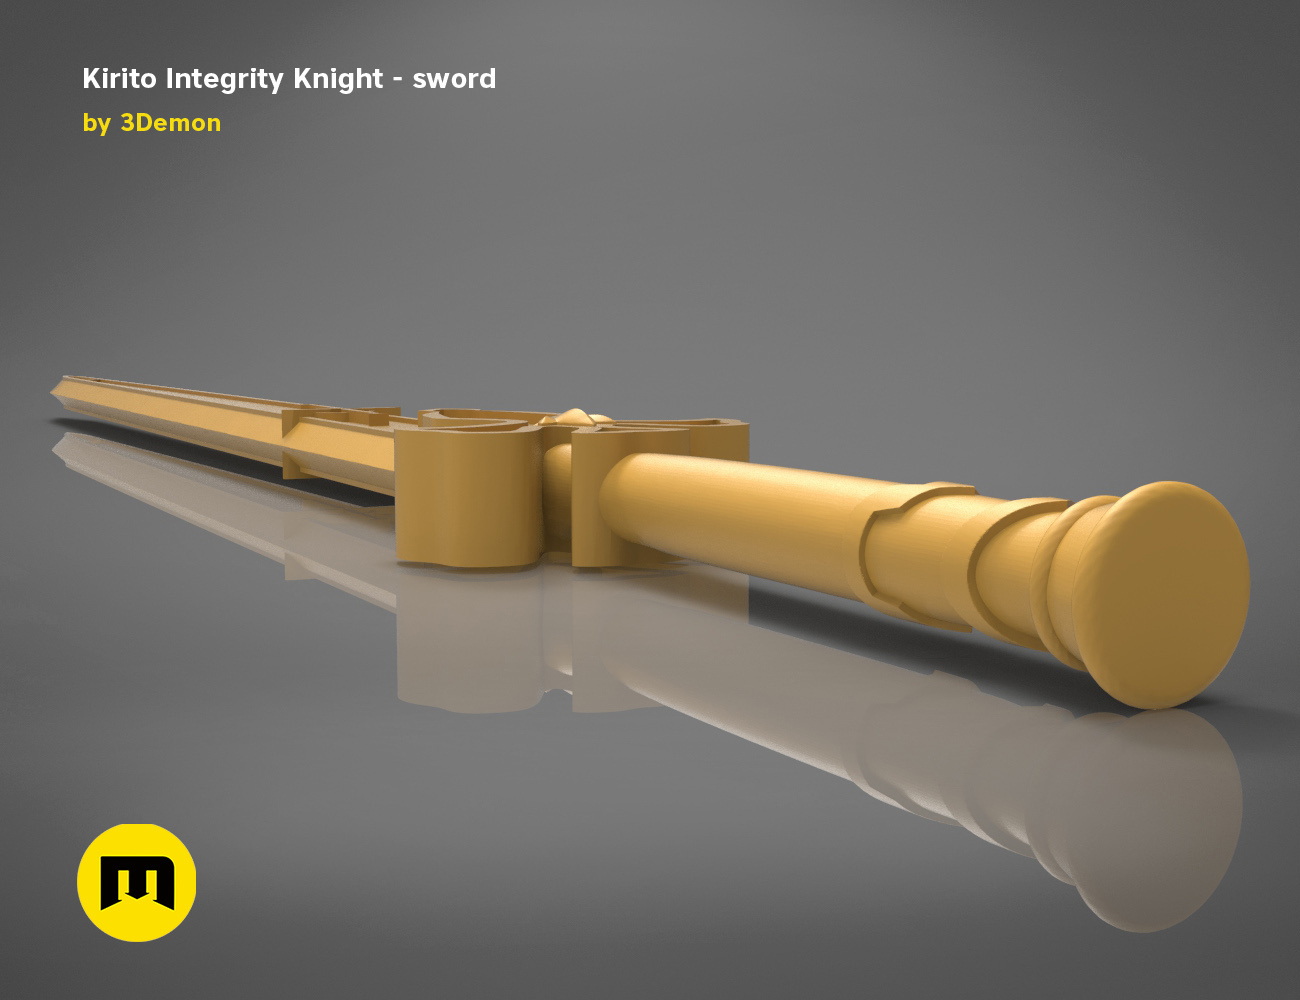 render_scene_Integrity-knight-sword-basic.18 kopie.jpg Download STL file Kirito's Sword - Integrity Knight • 3D print model, 3D-mon